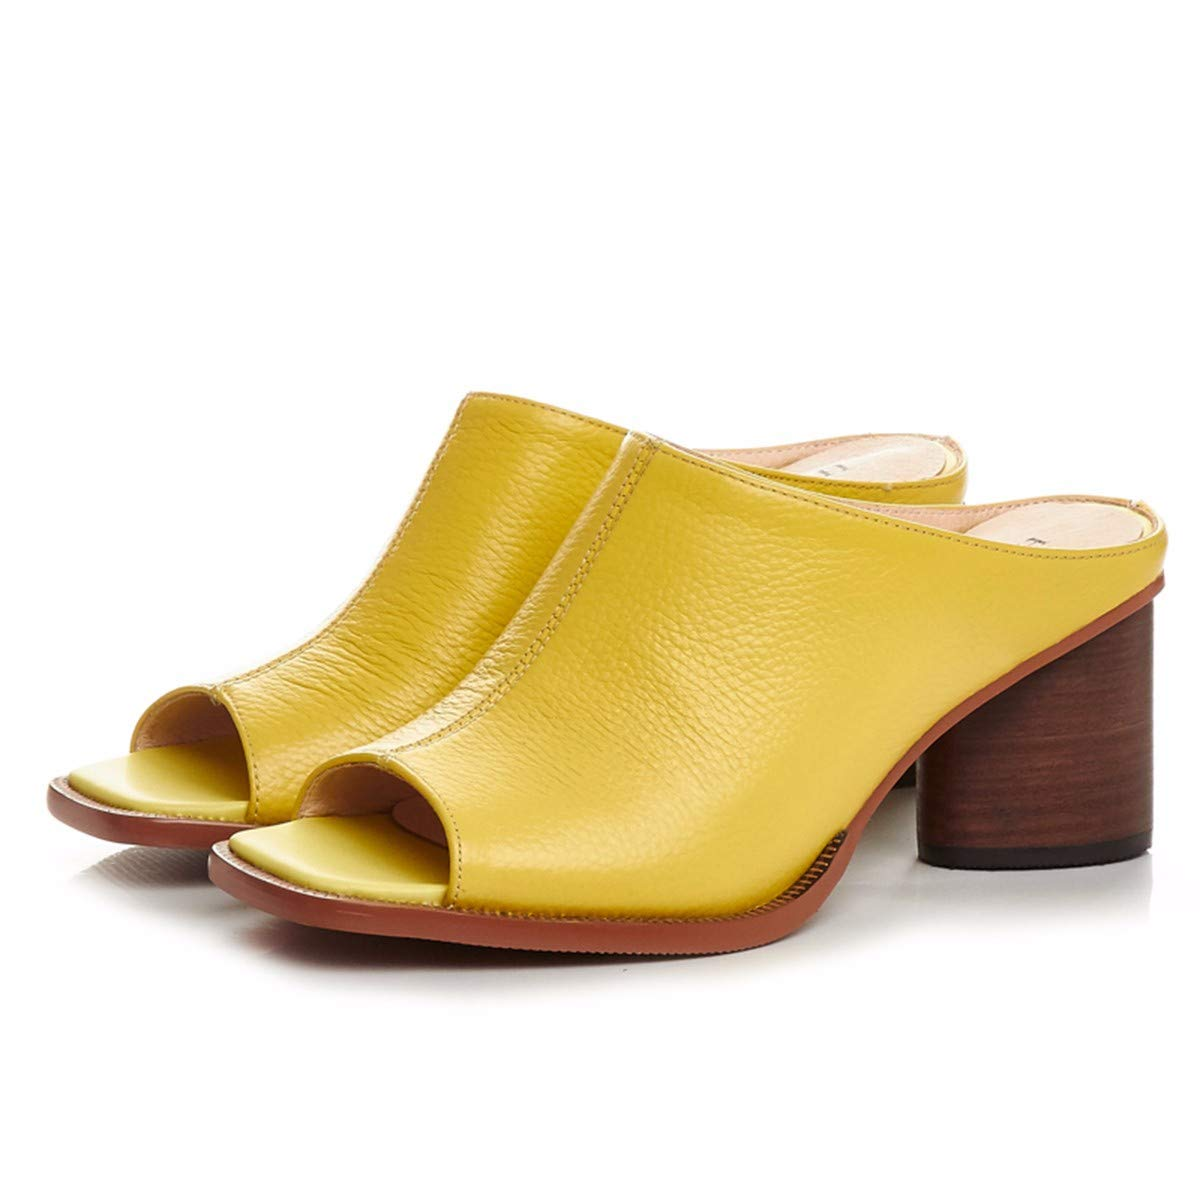 KPHY Damenschuhe Im Square Sommer Tragen Modische Square Im Rau Retro Müller-Schuhe Echtem Leder High Heels und Coole Schuhe 8 cm.35 Gelb d418a5